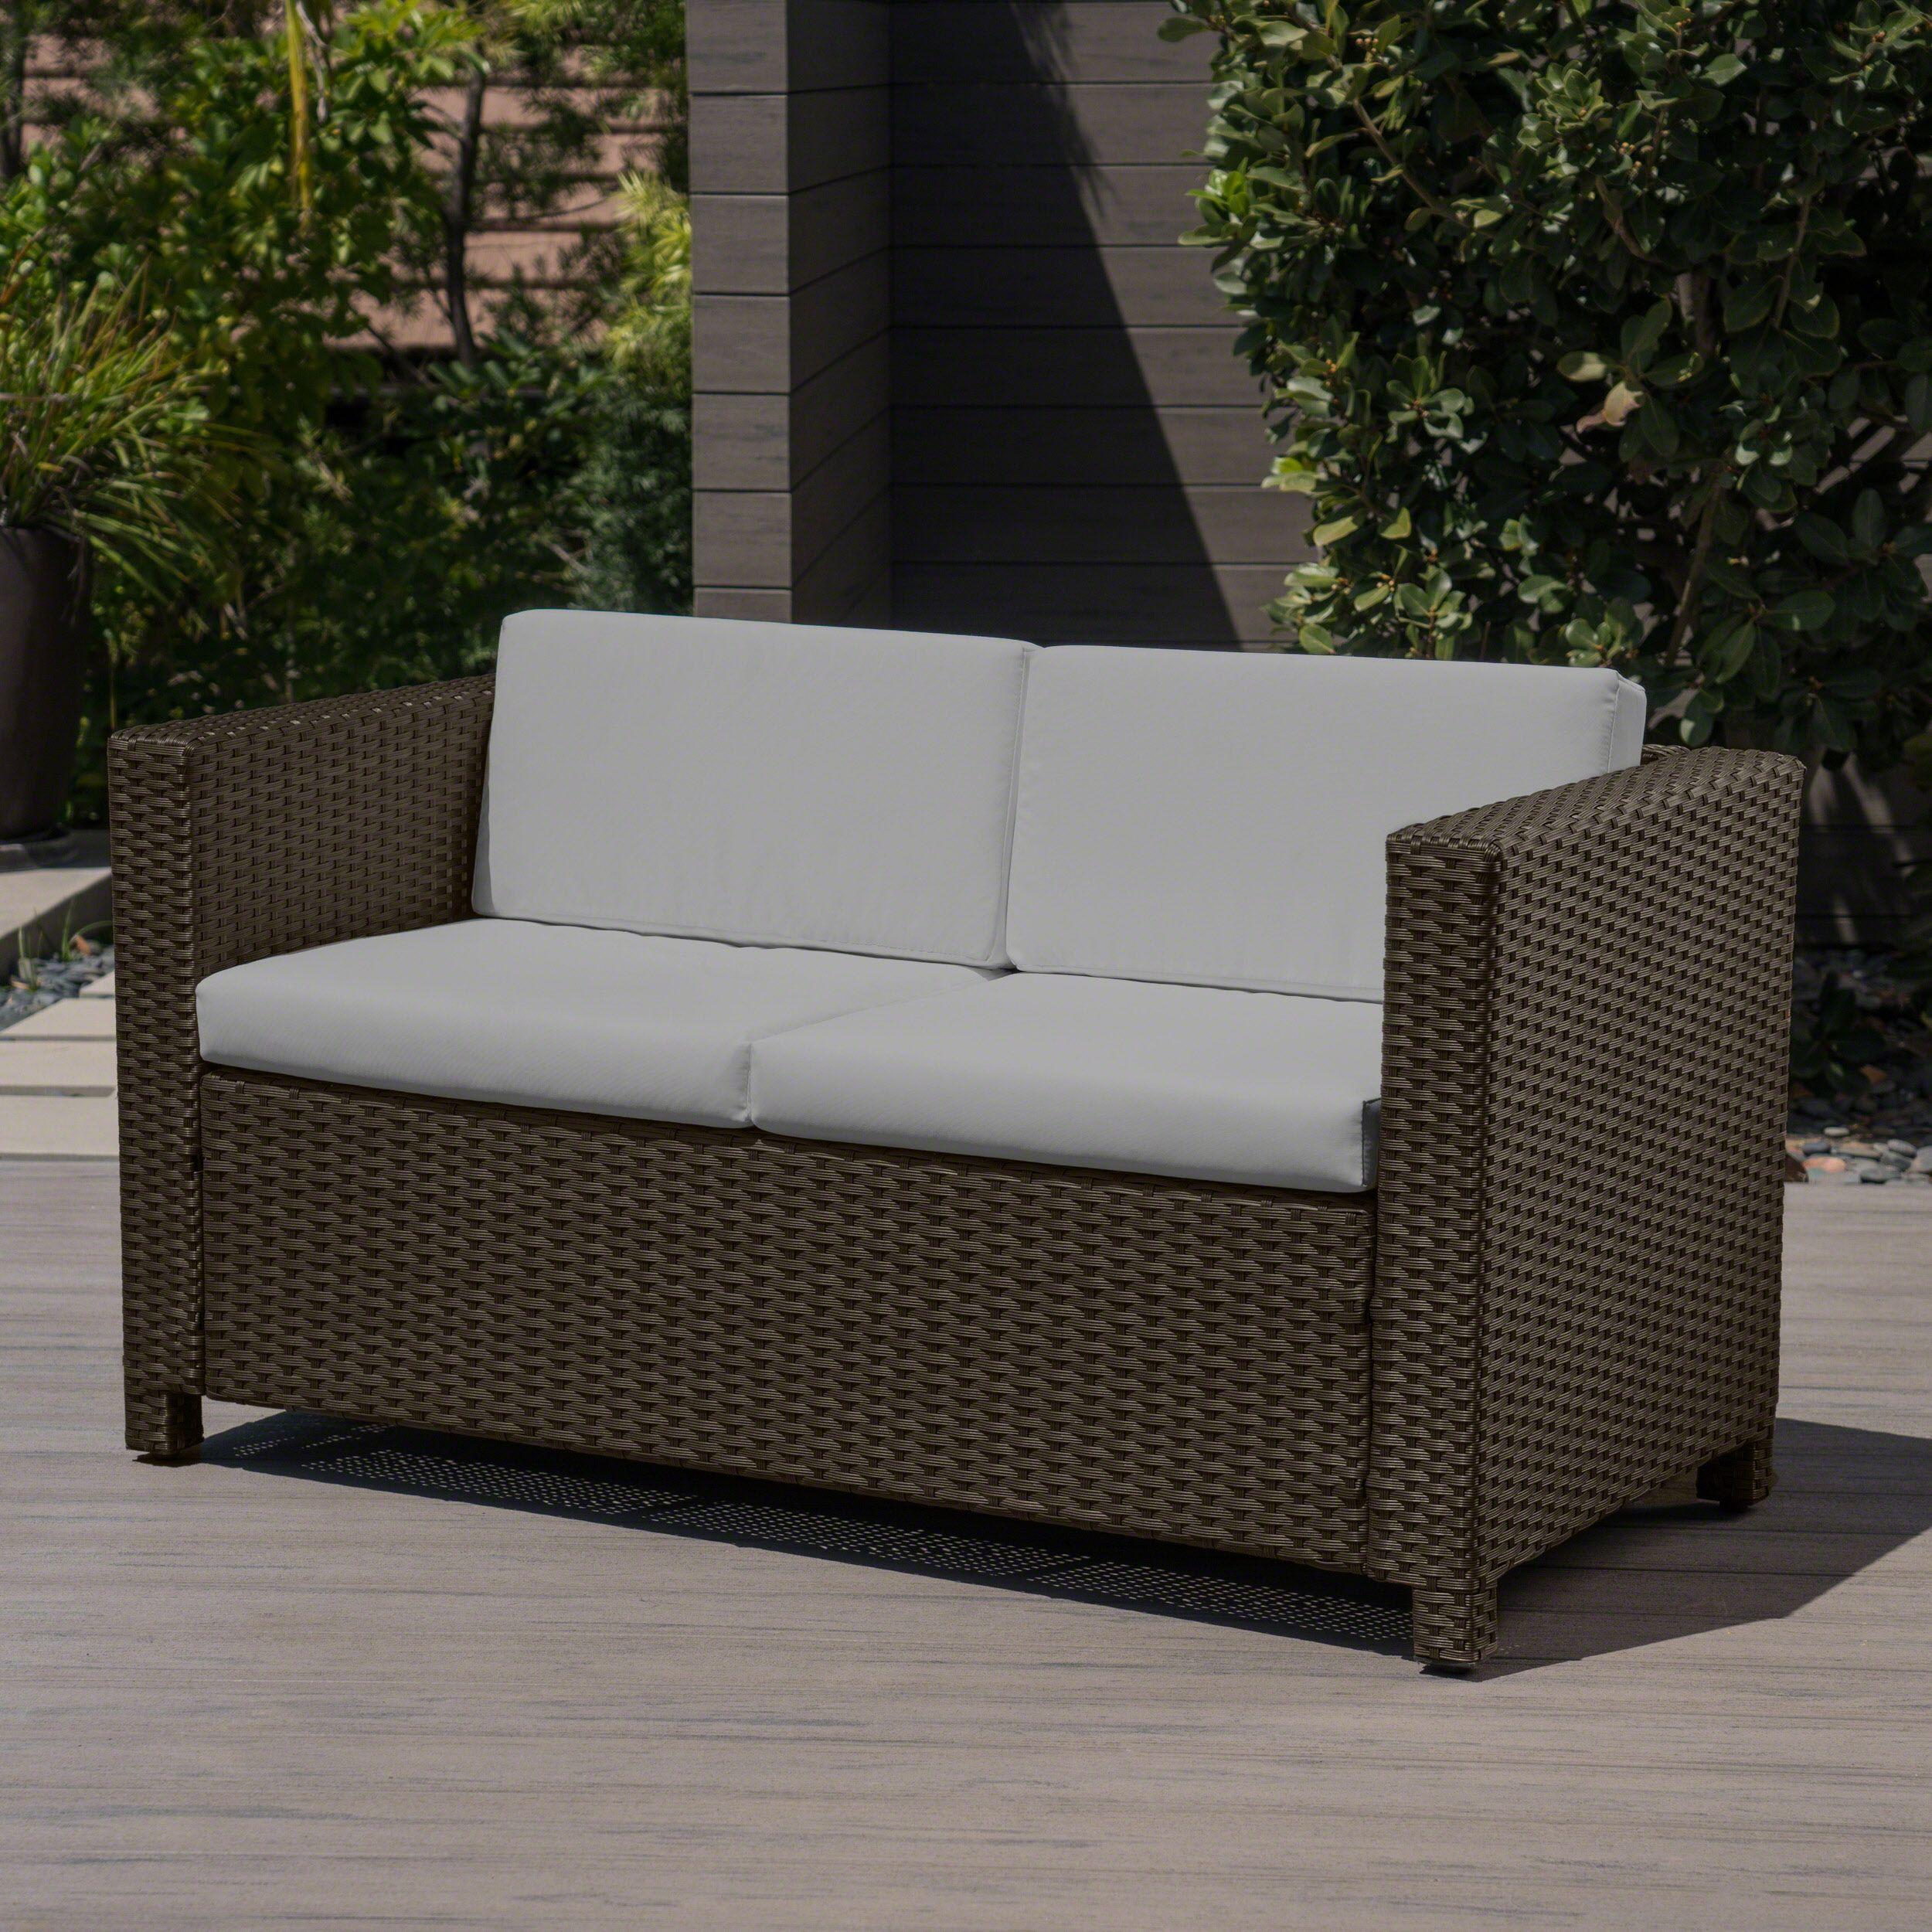 Pattillas Outdoor Wicker Loveseat With Cushions Brown Ceramic Grey Walmart Com In 2020 Wicker Loveseat Outdoor Wicker Patio Loveseat